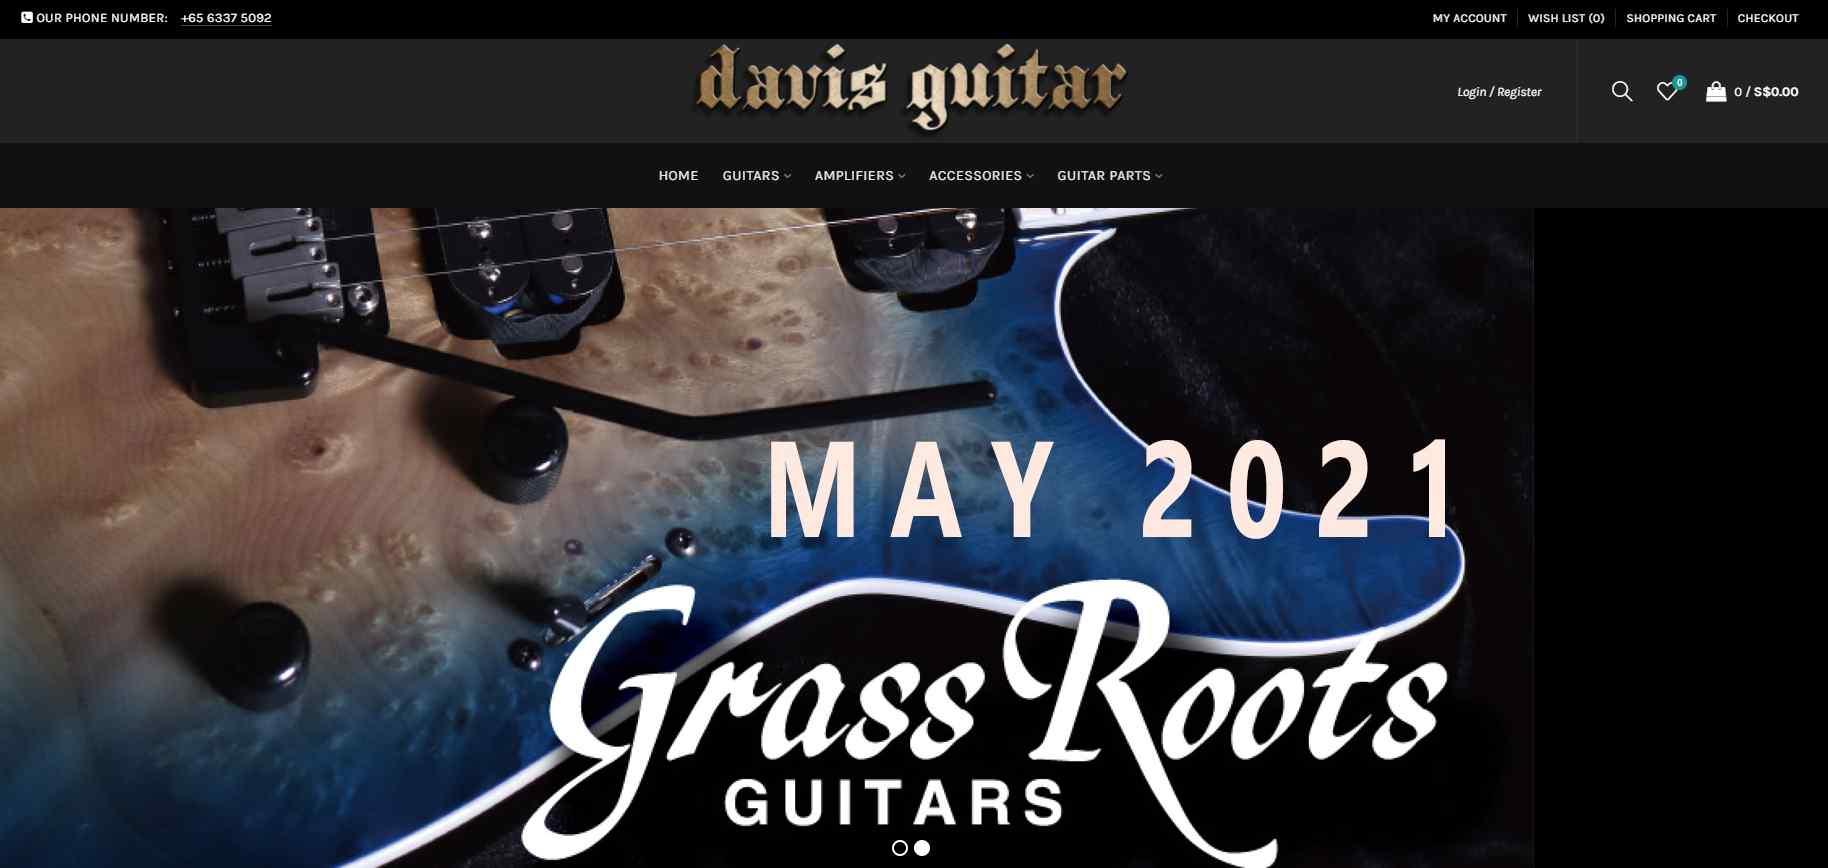 davis guitar Top Music Stores in Singapore